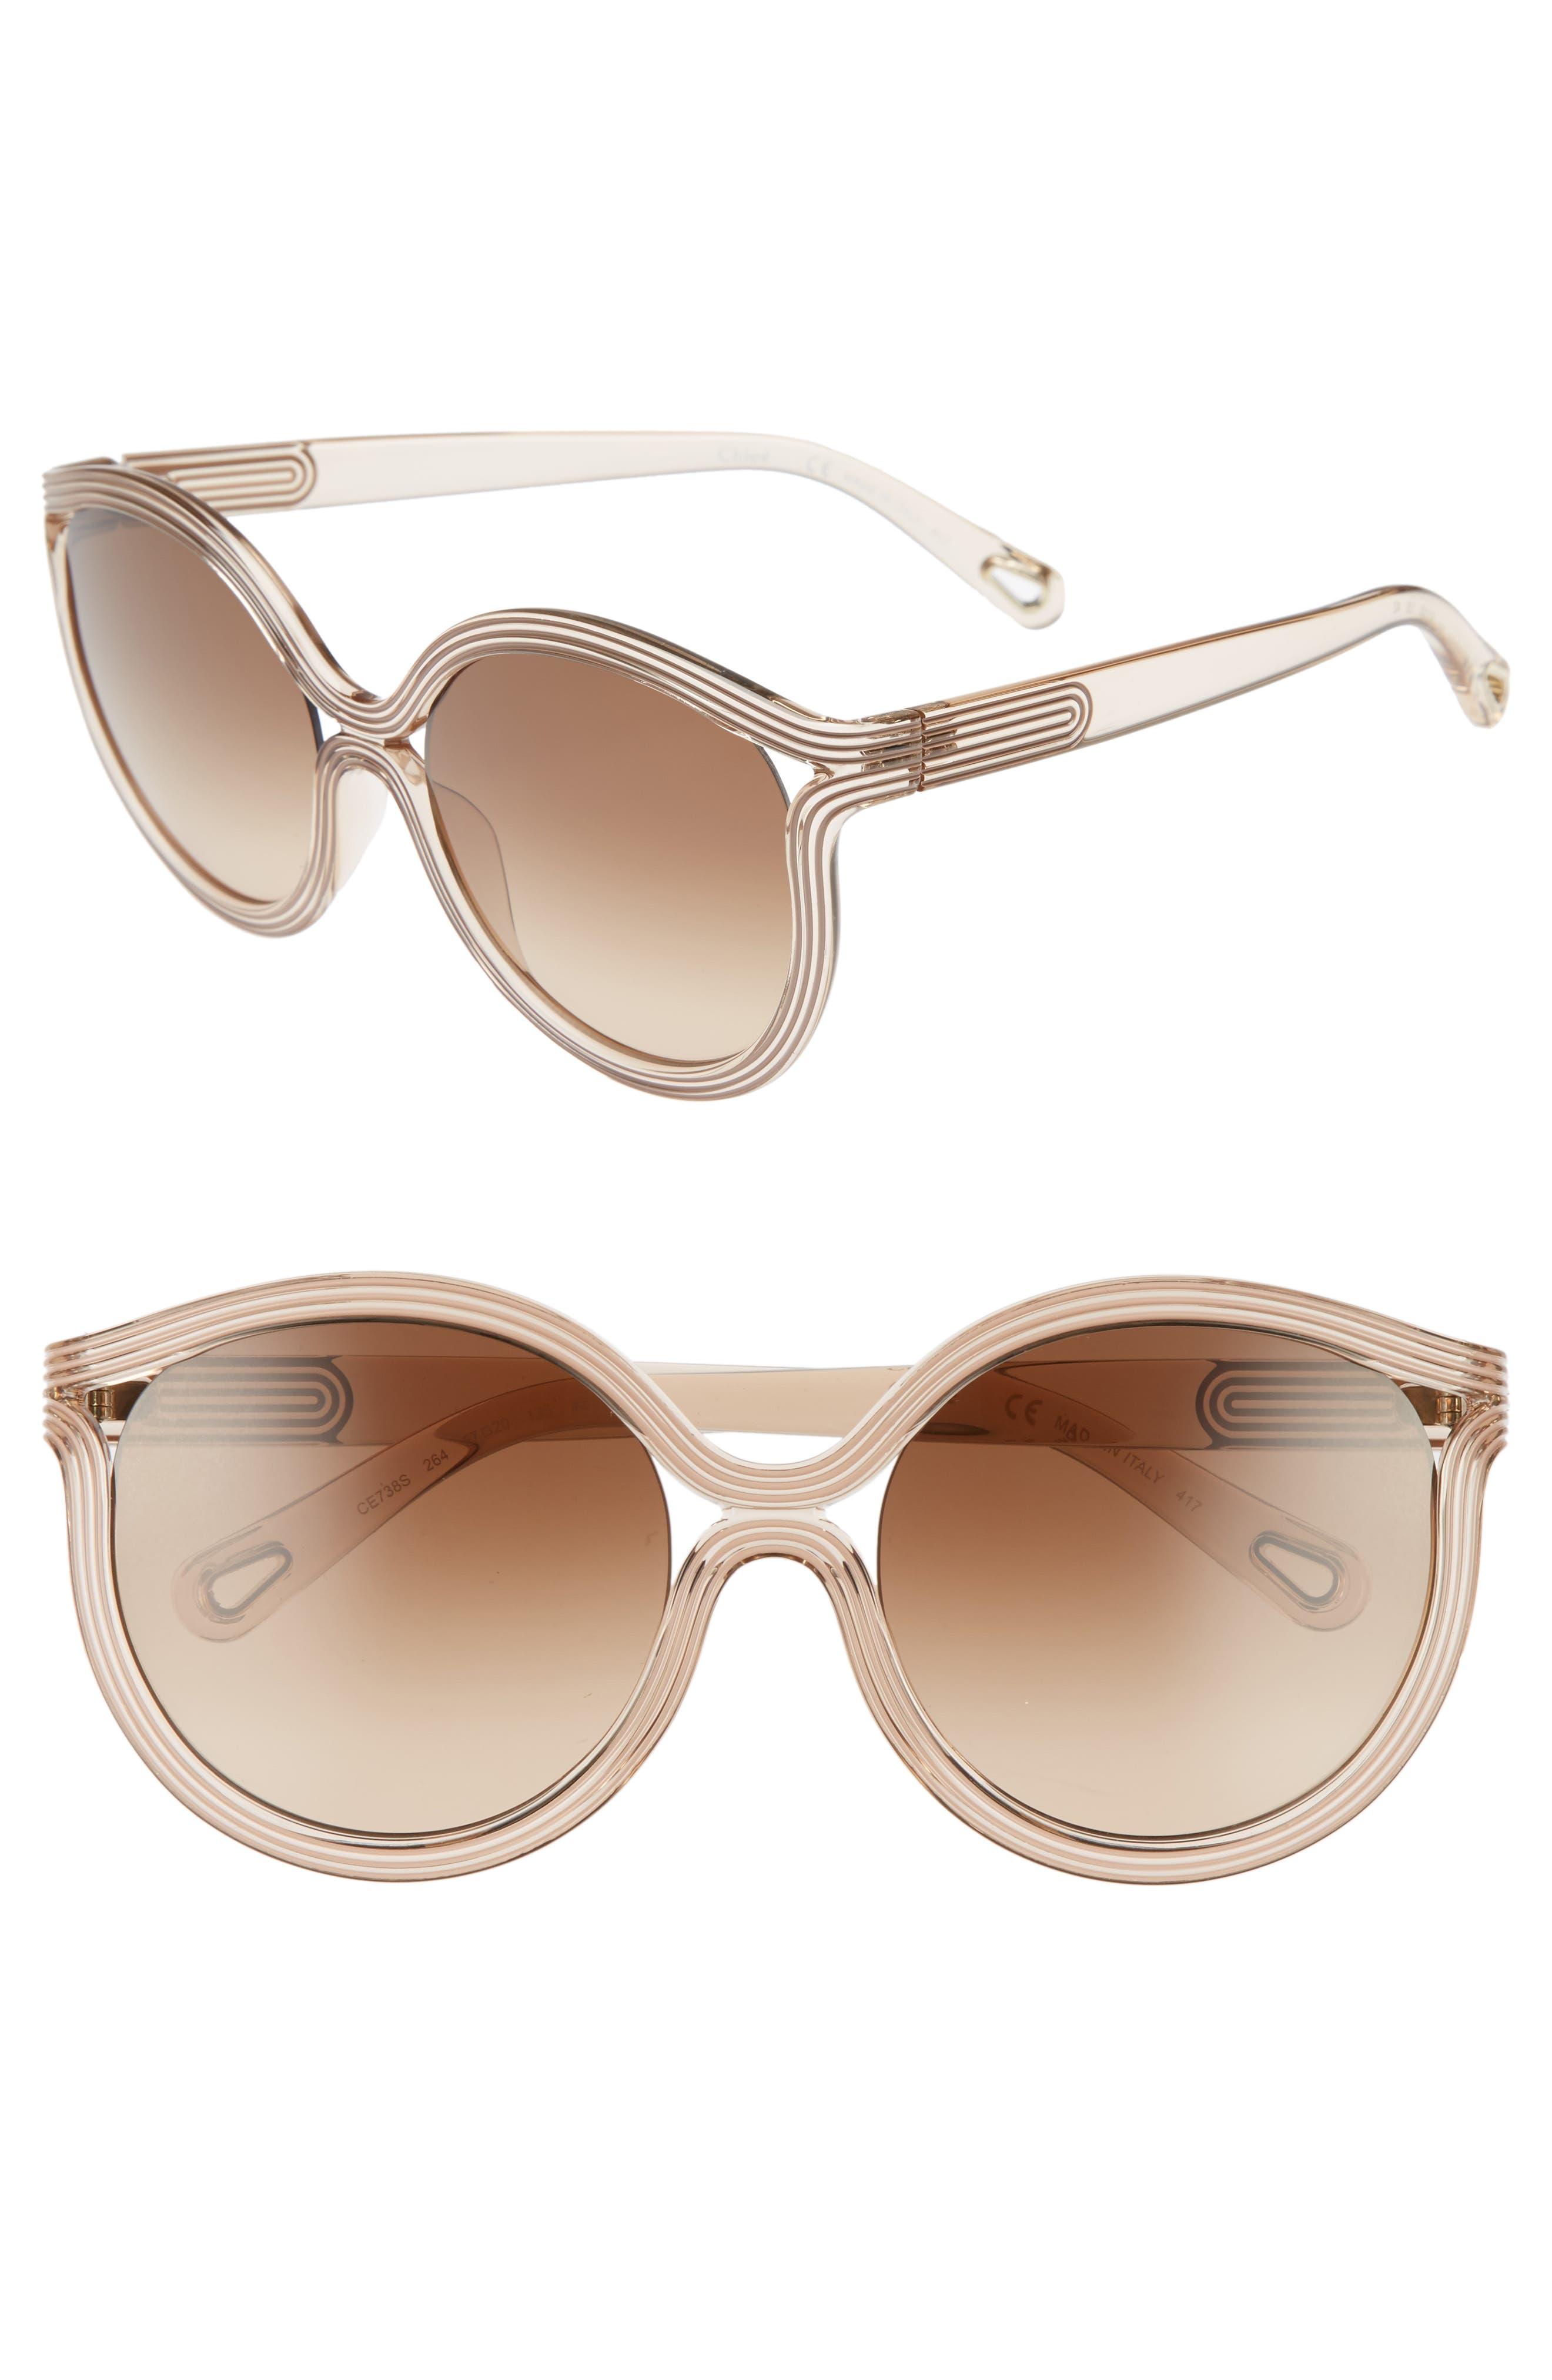 Image of Chloe 57mm Modified Cat Eye Sunglasses